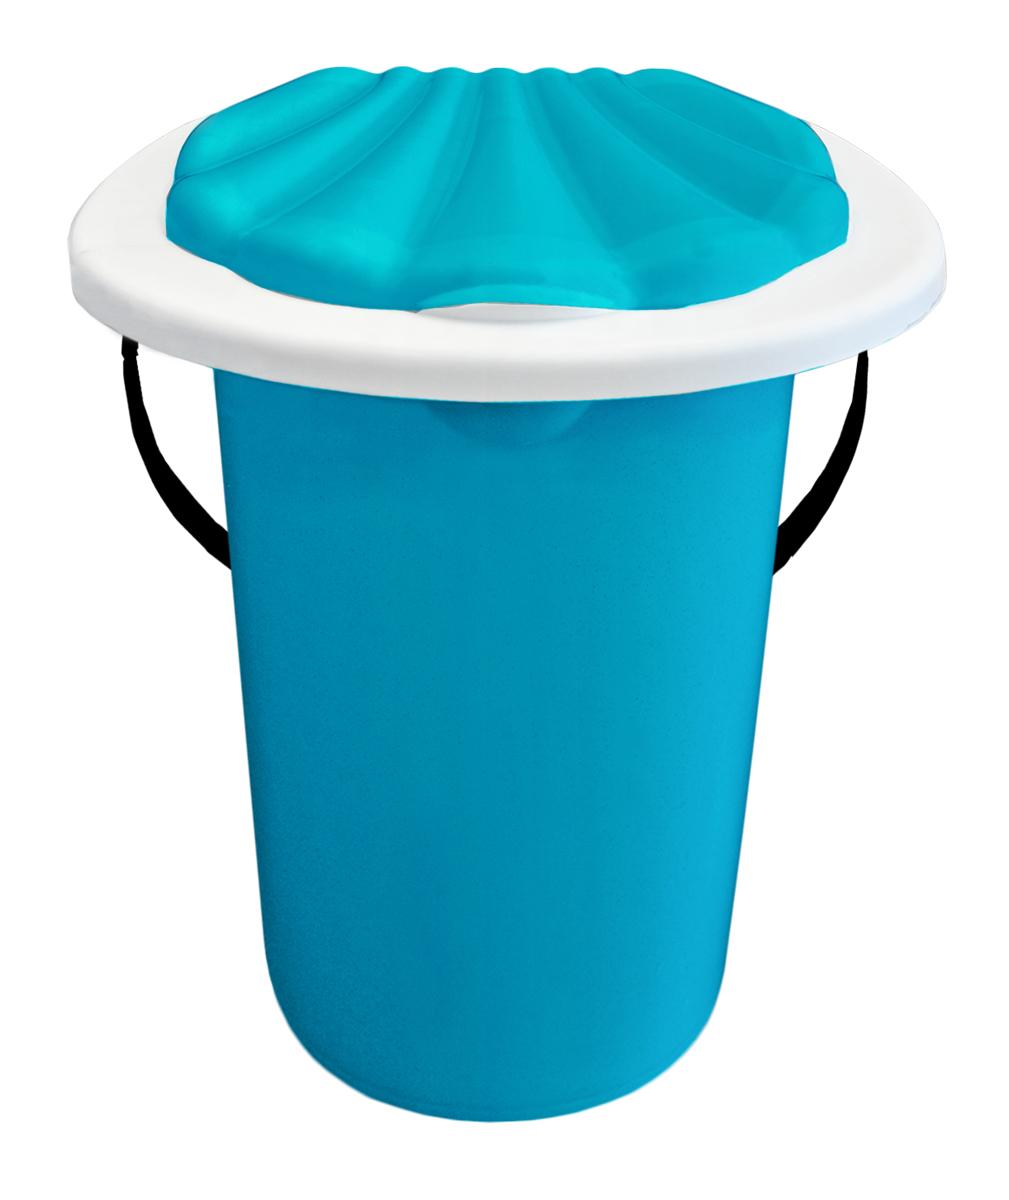 Ведро-туалет  InGreen , цвет: светло-синий, 20 л - Биотуалеты и септики